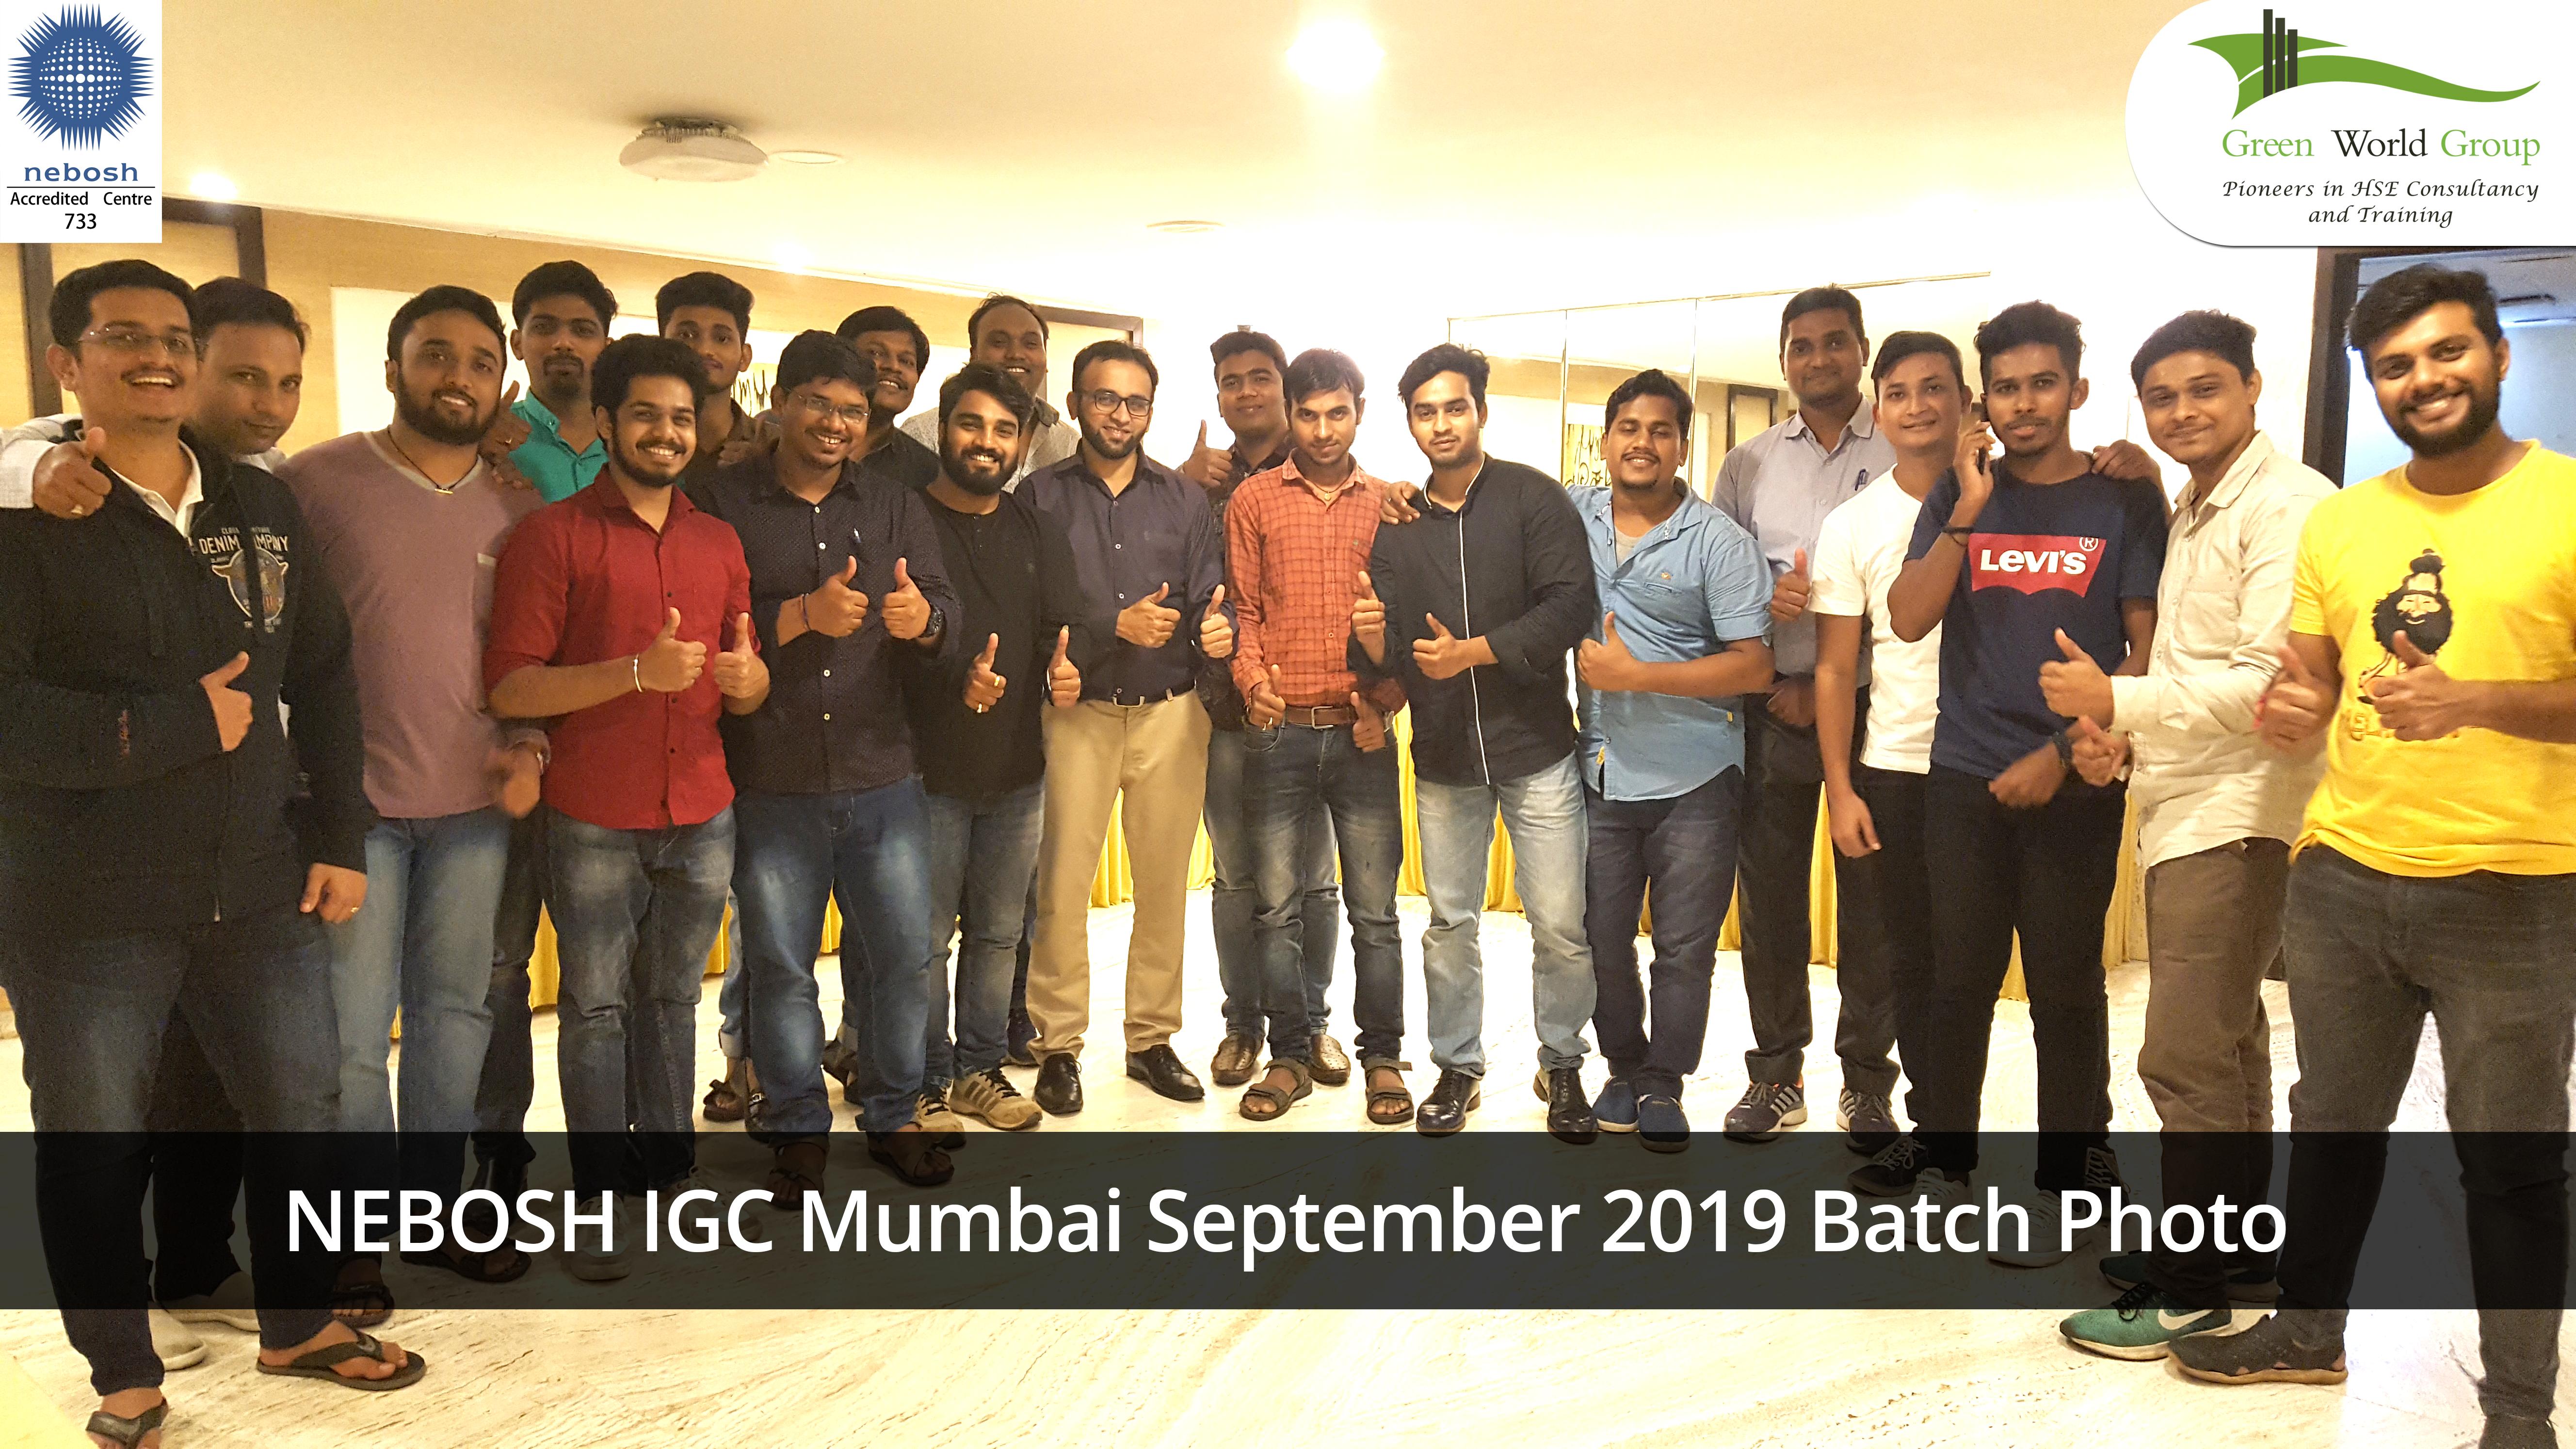 NEBOSH IGC Mumbai September 2019 Batch Photo